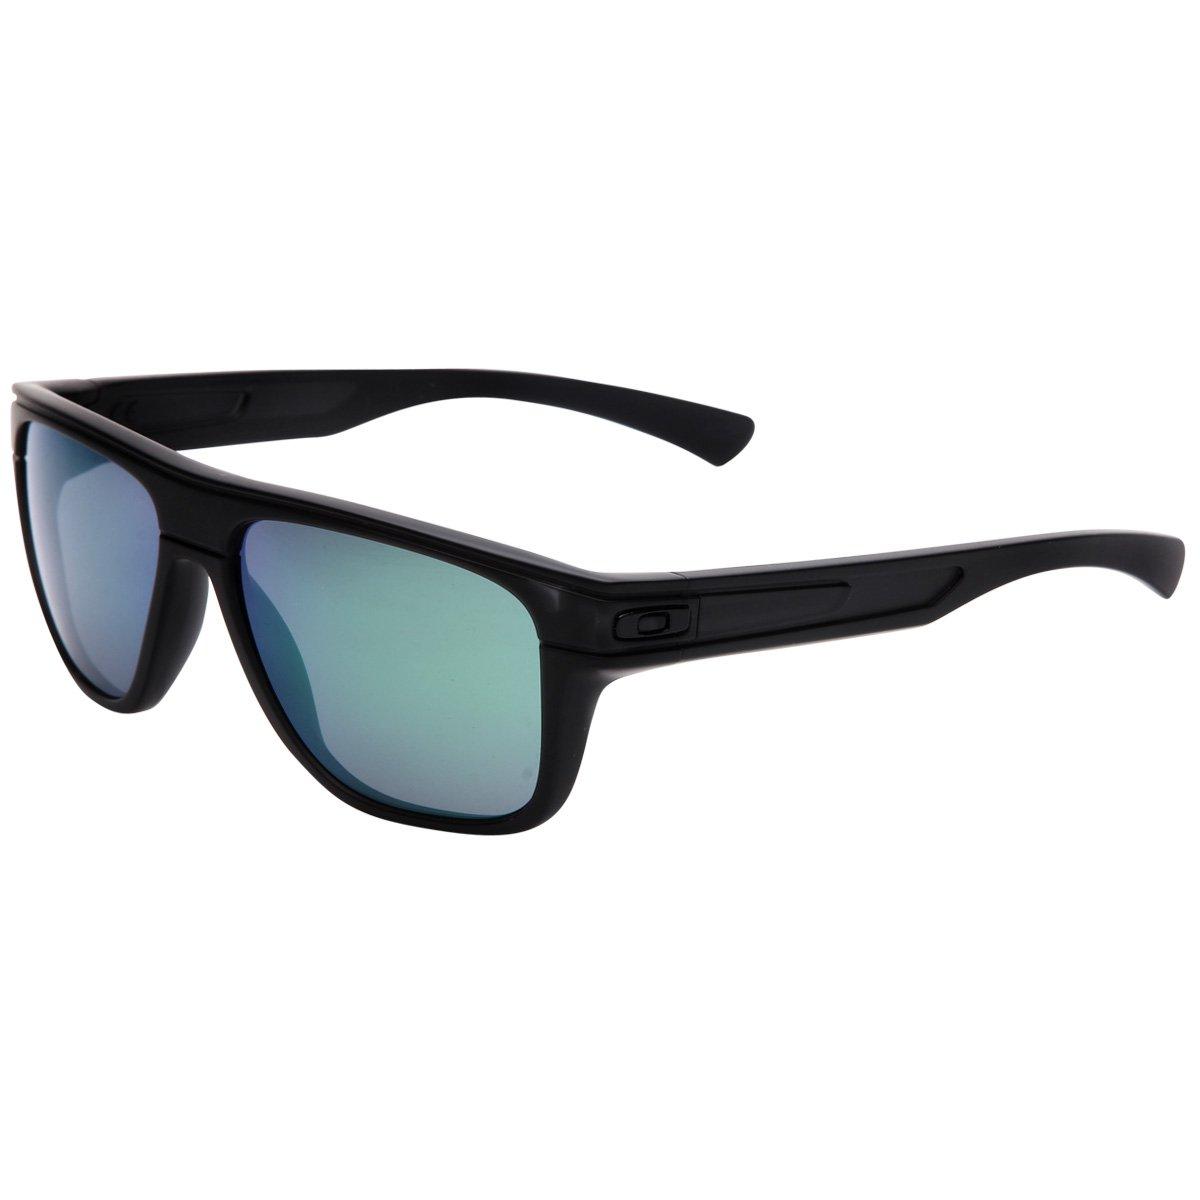 6d320121f06c9 Óculos Oakley Breadbox - Iridium - Compre Agora